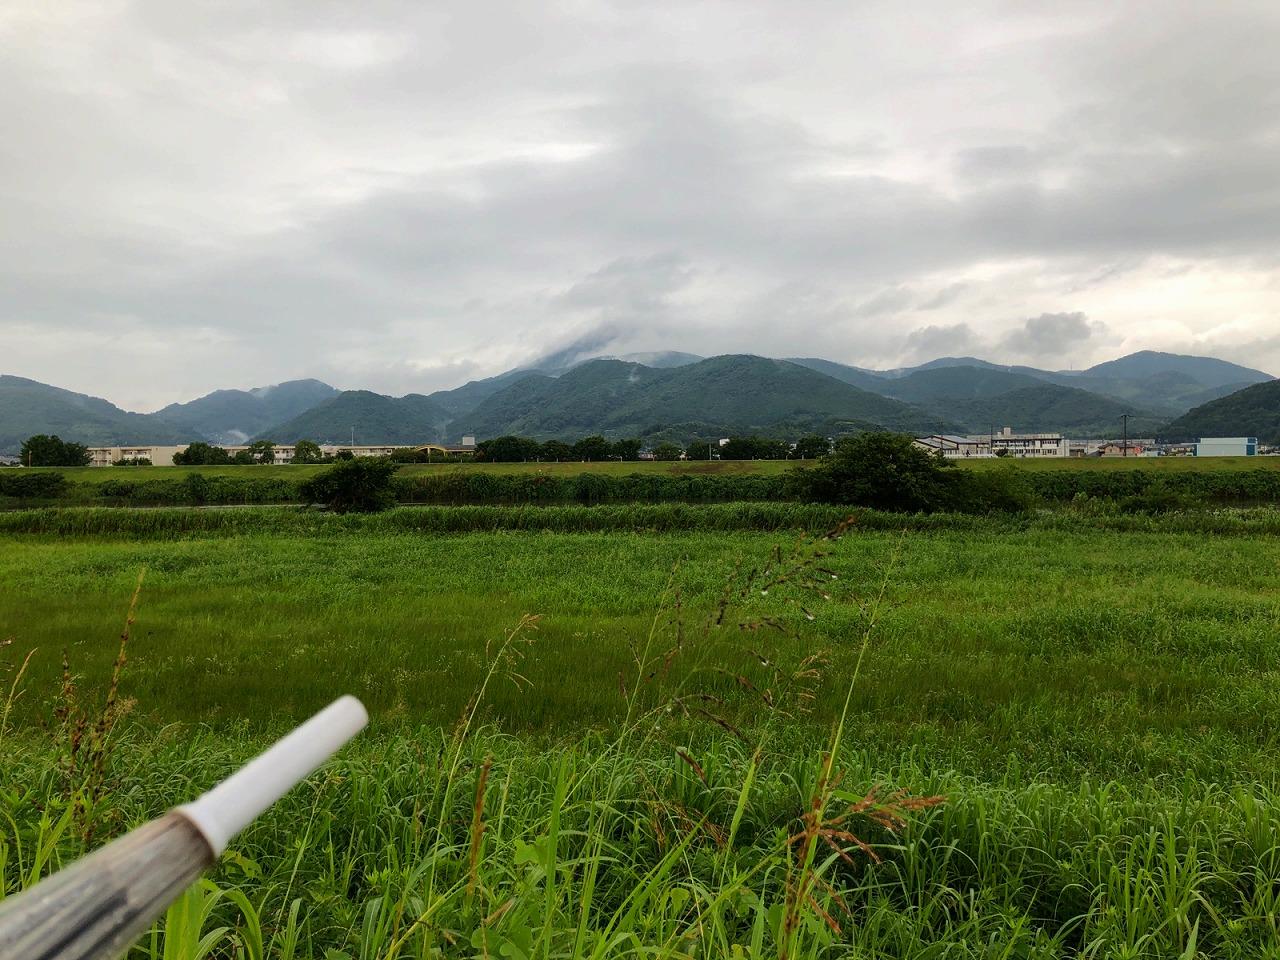 2018.7.6 今朝の金峰山